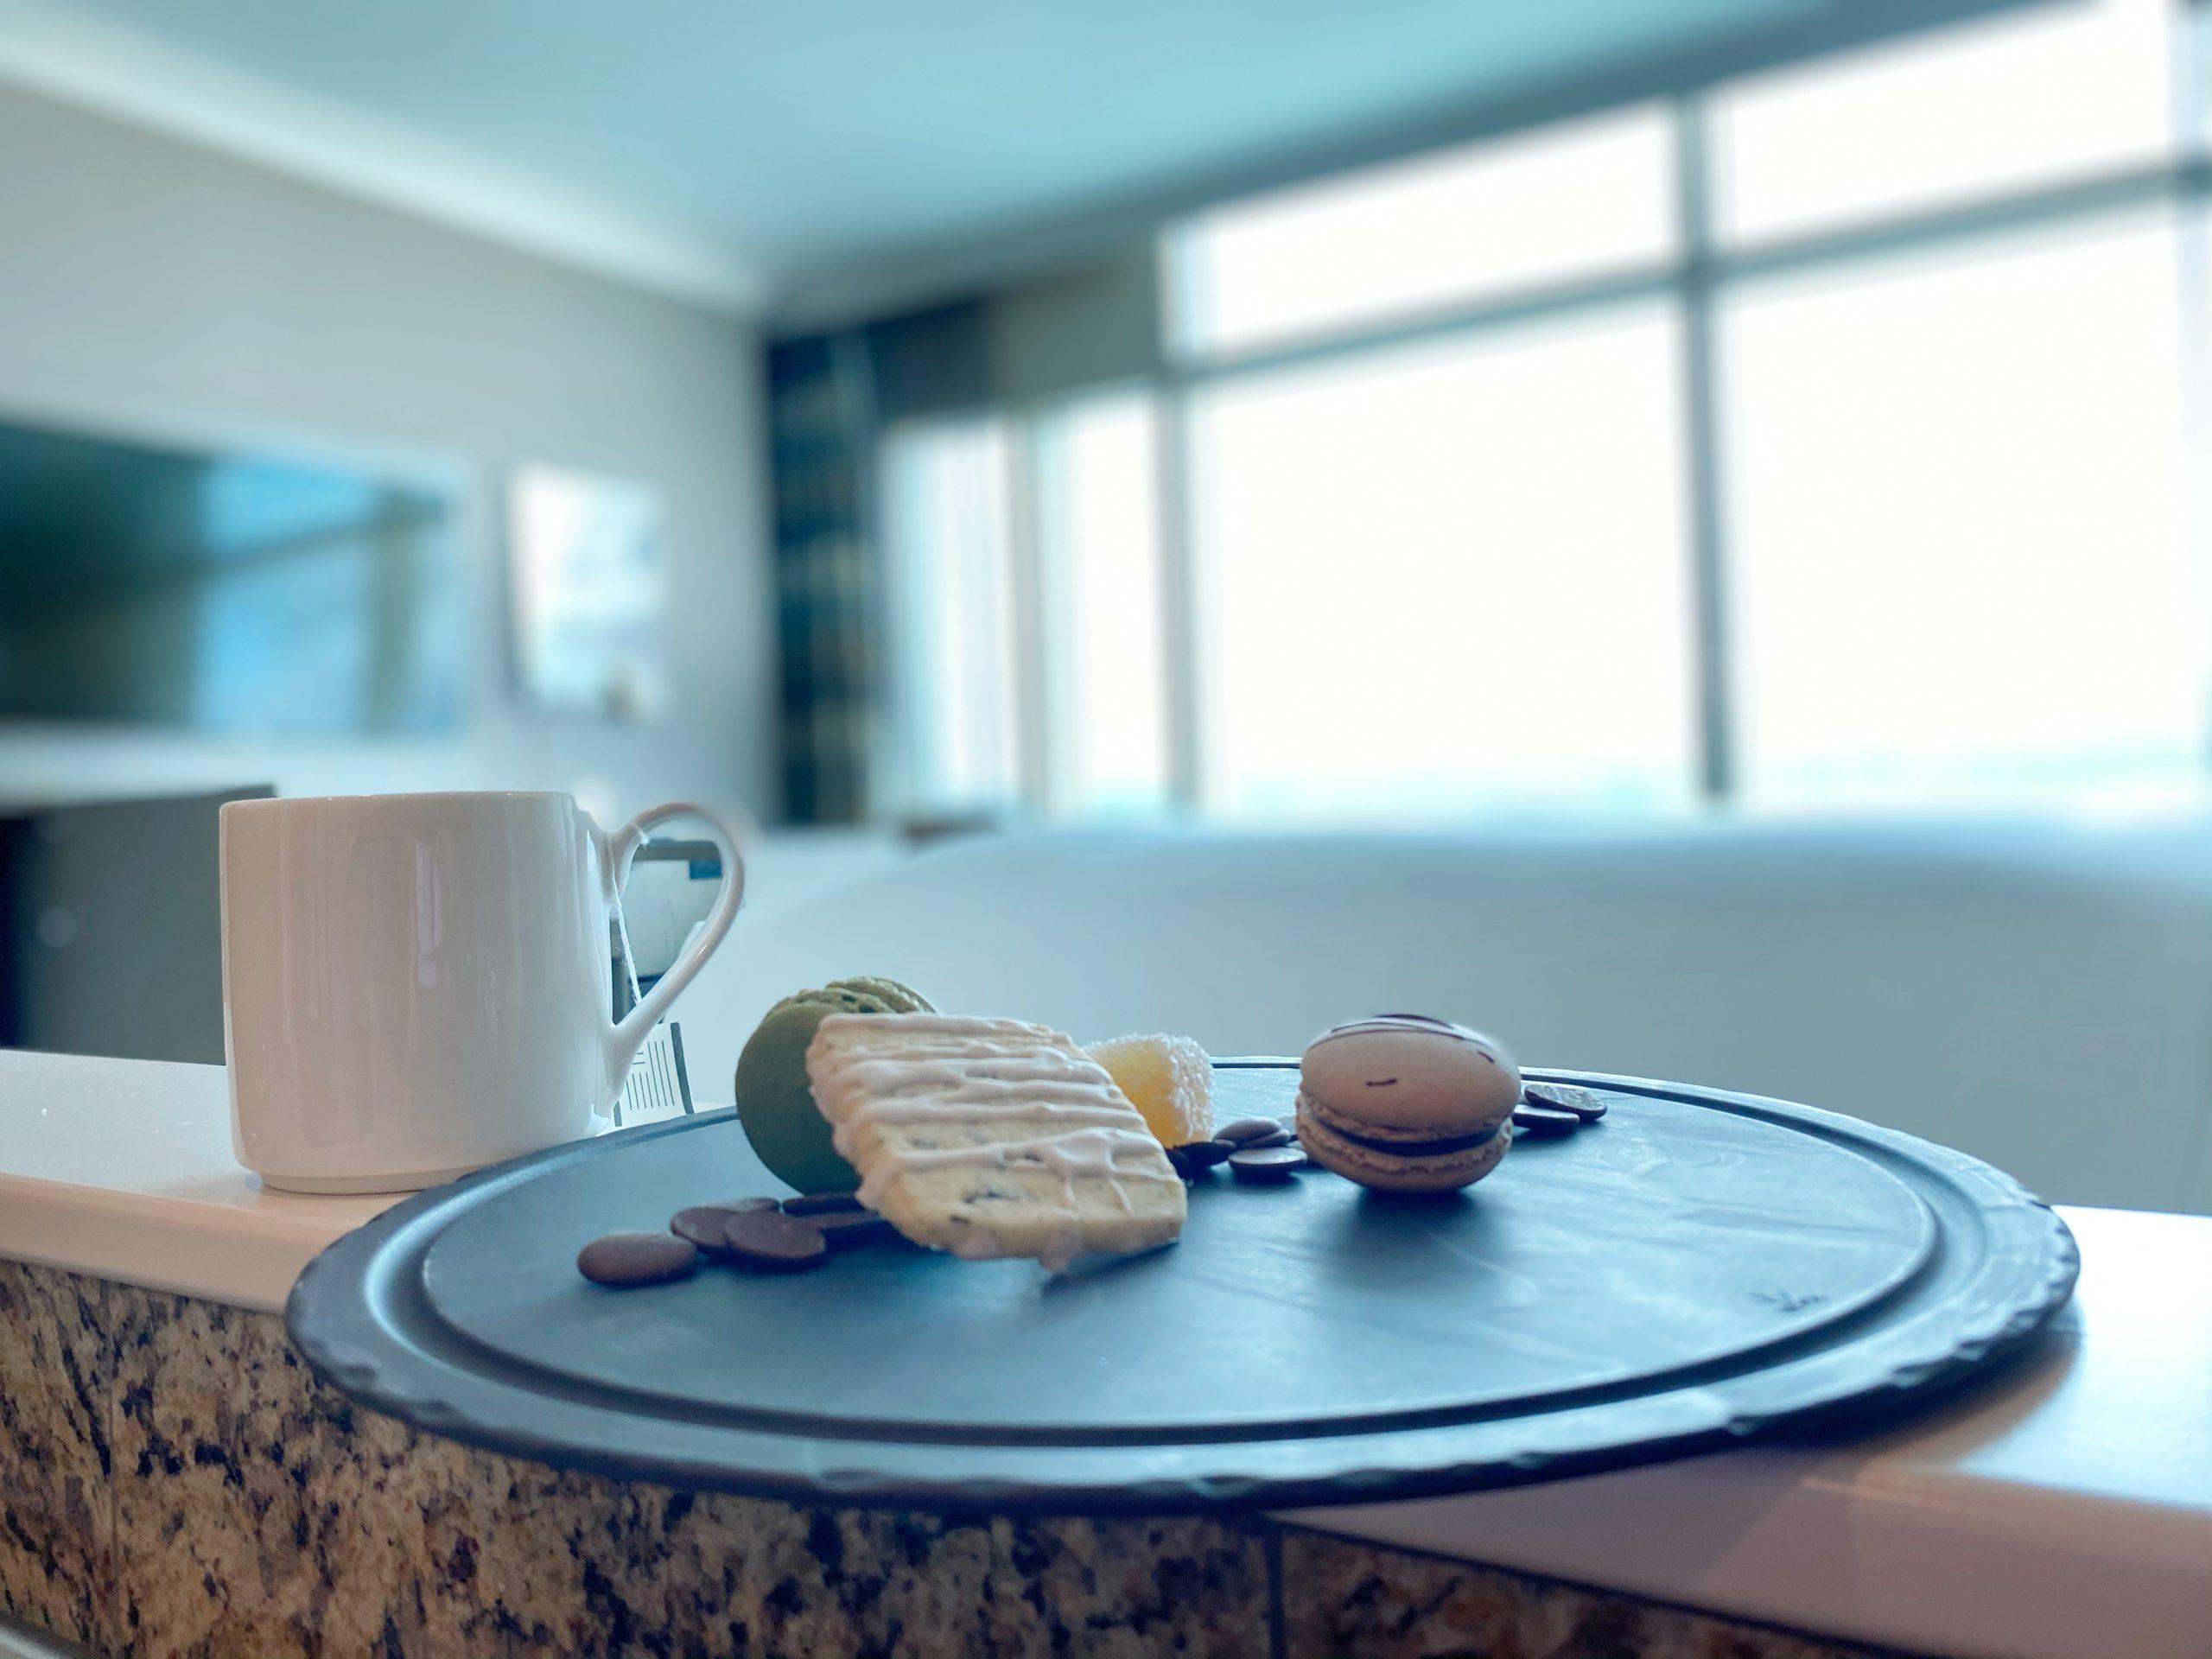 Bathtub-side tea and treats at the Fairmont YVR.